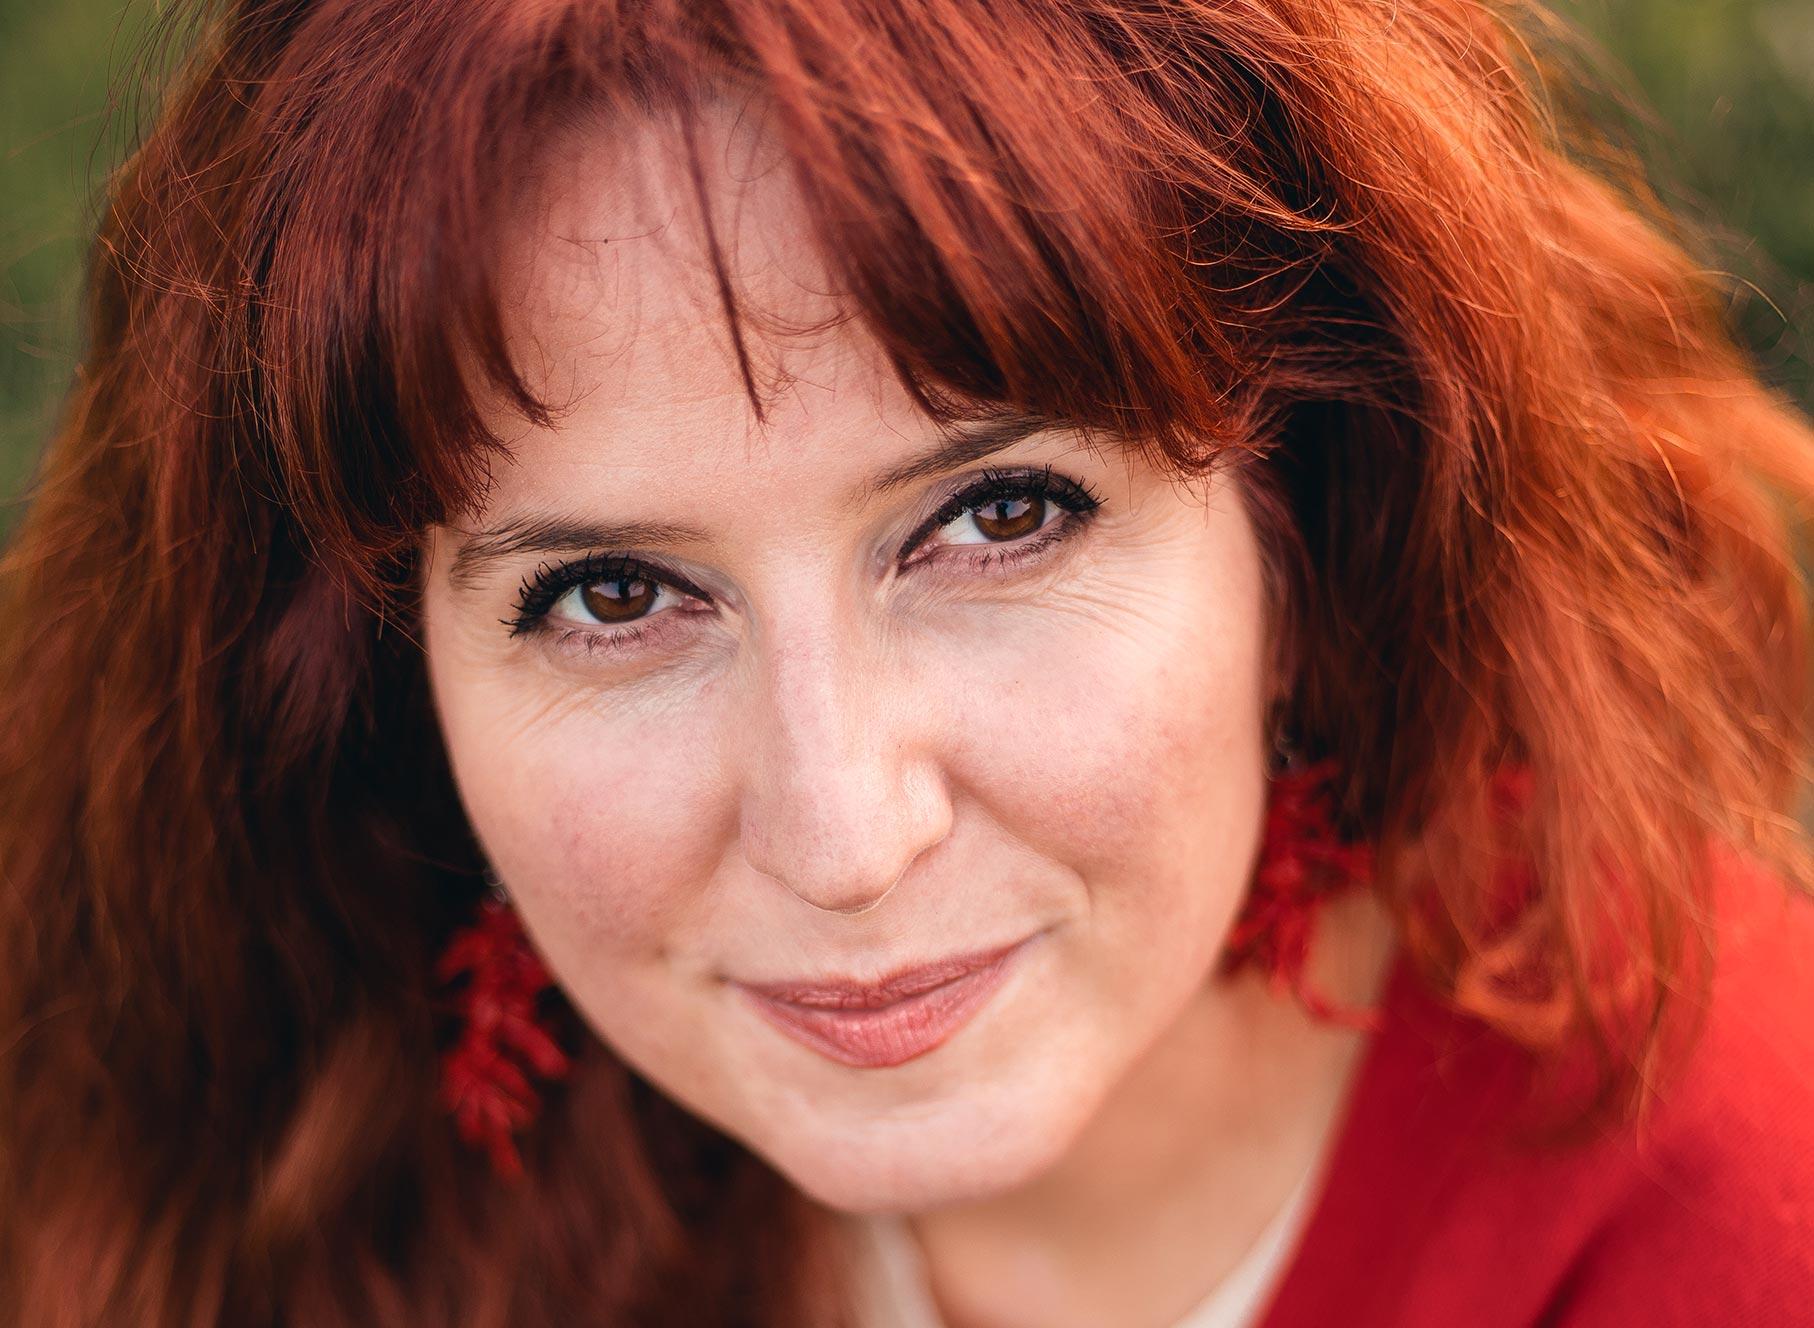 Curriculum Vitae - Olivia Ceobotaru psicologa a Roma